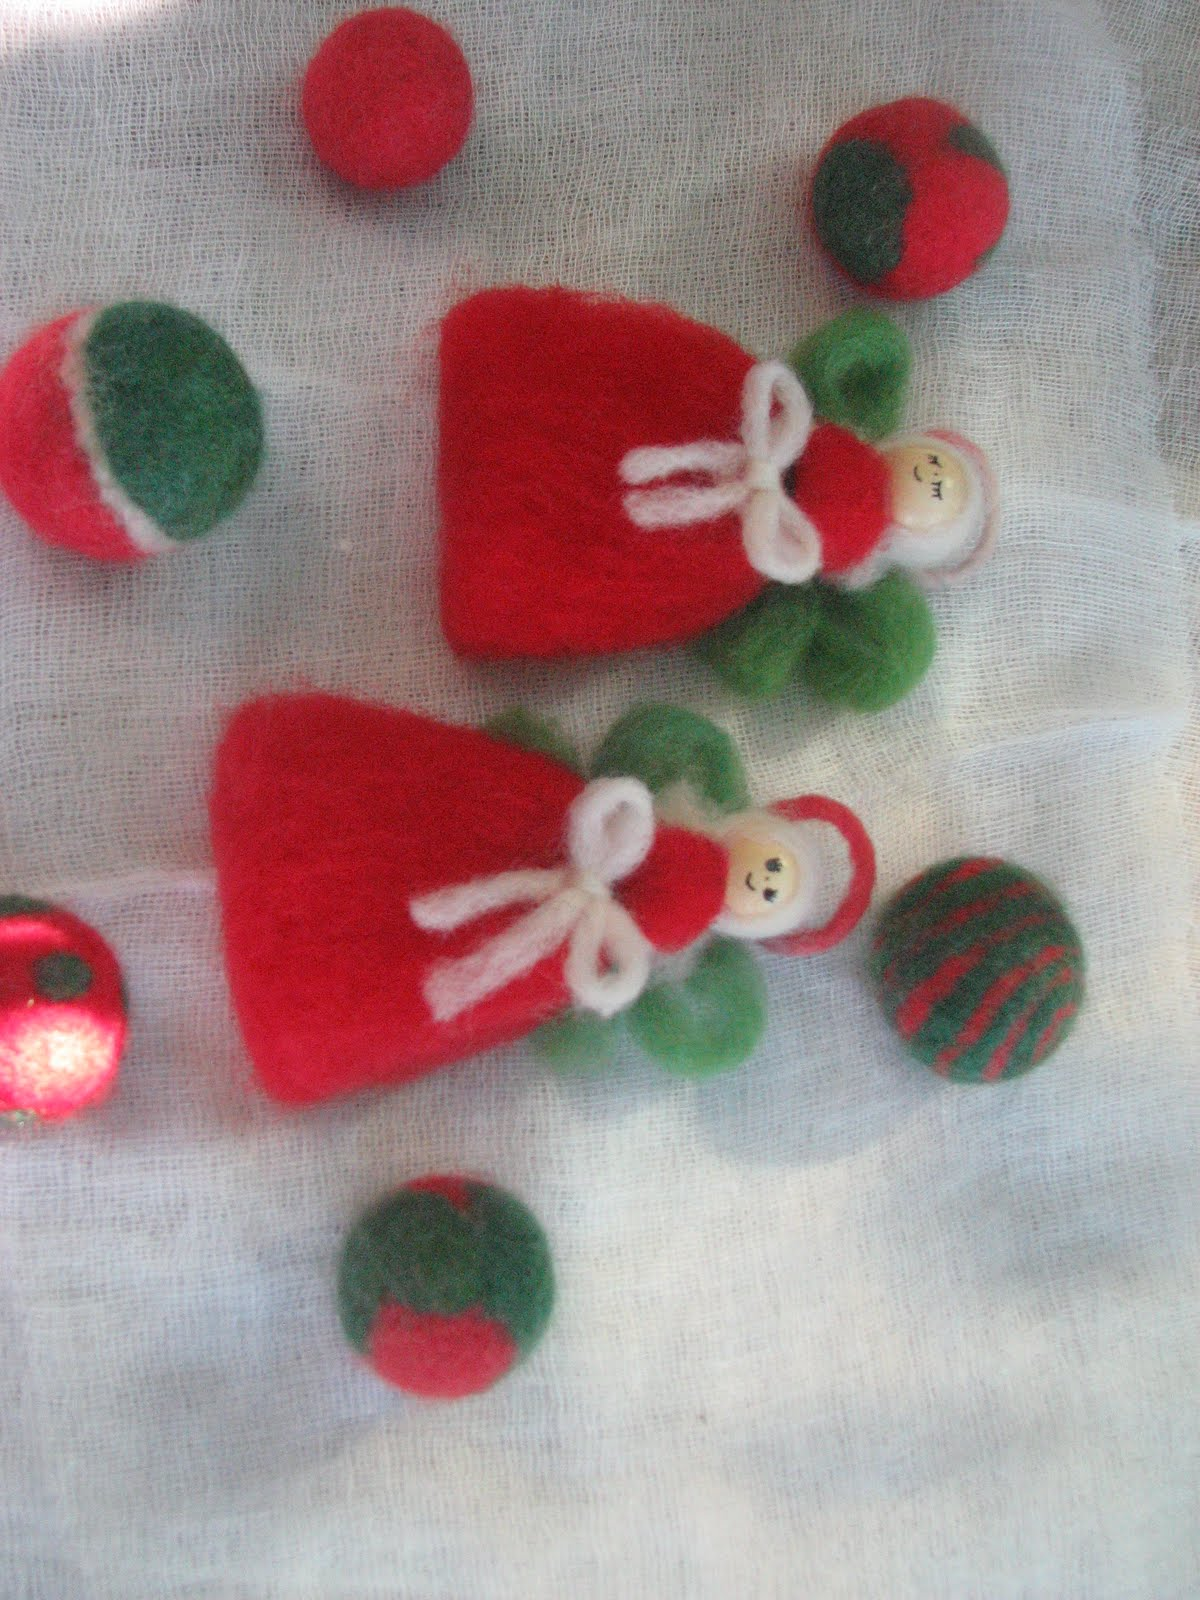 Kreativo fieltro artesanal navidad en fieltro artesanal - Decoracion navidena artesanal ...